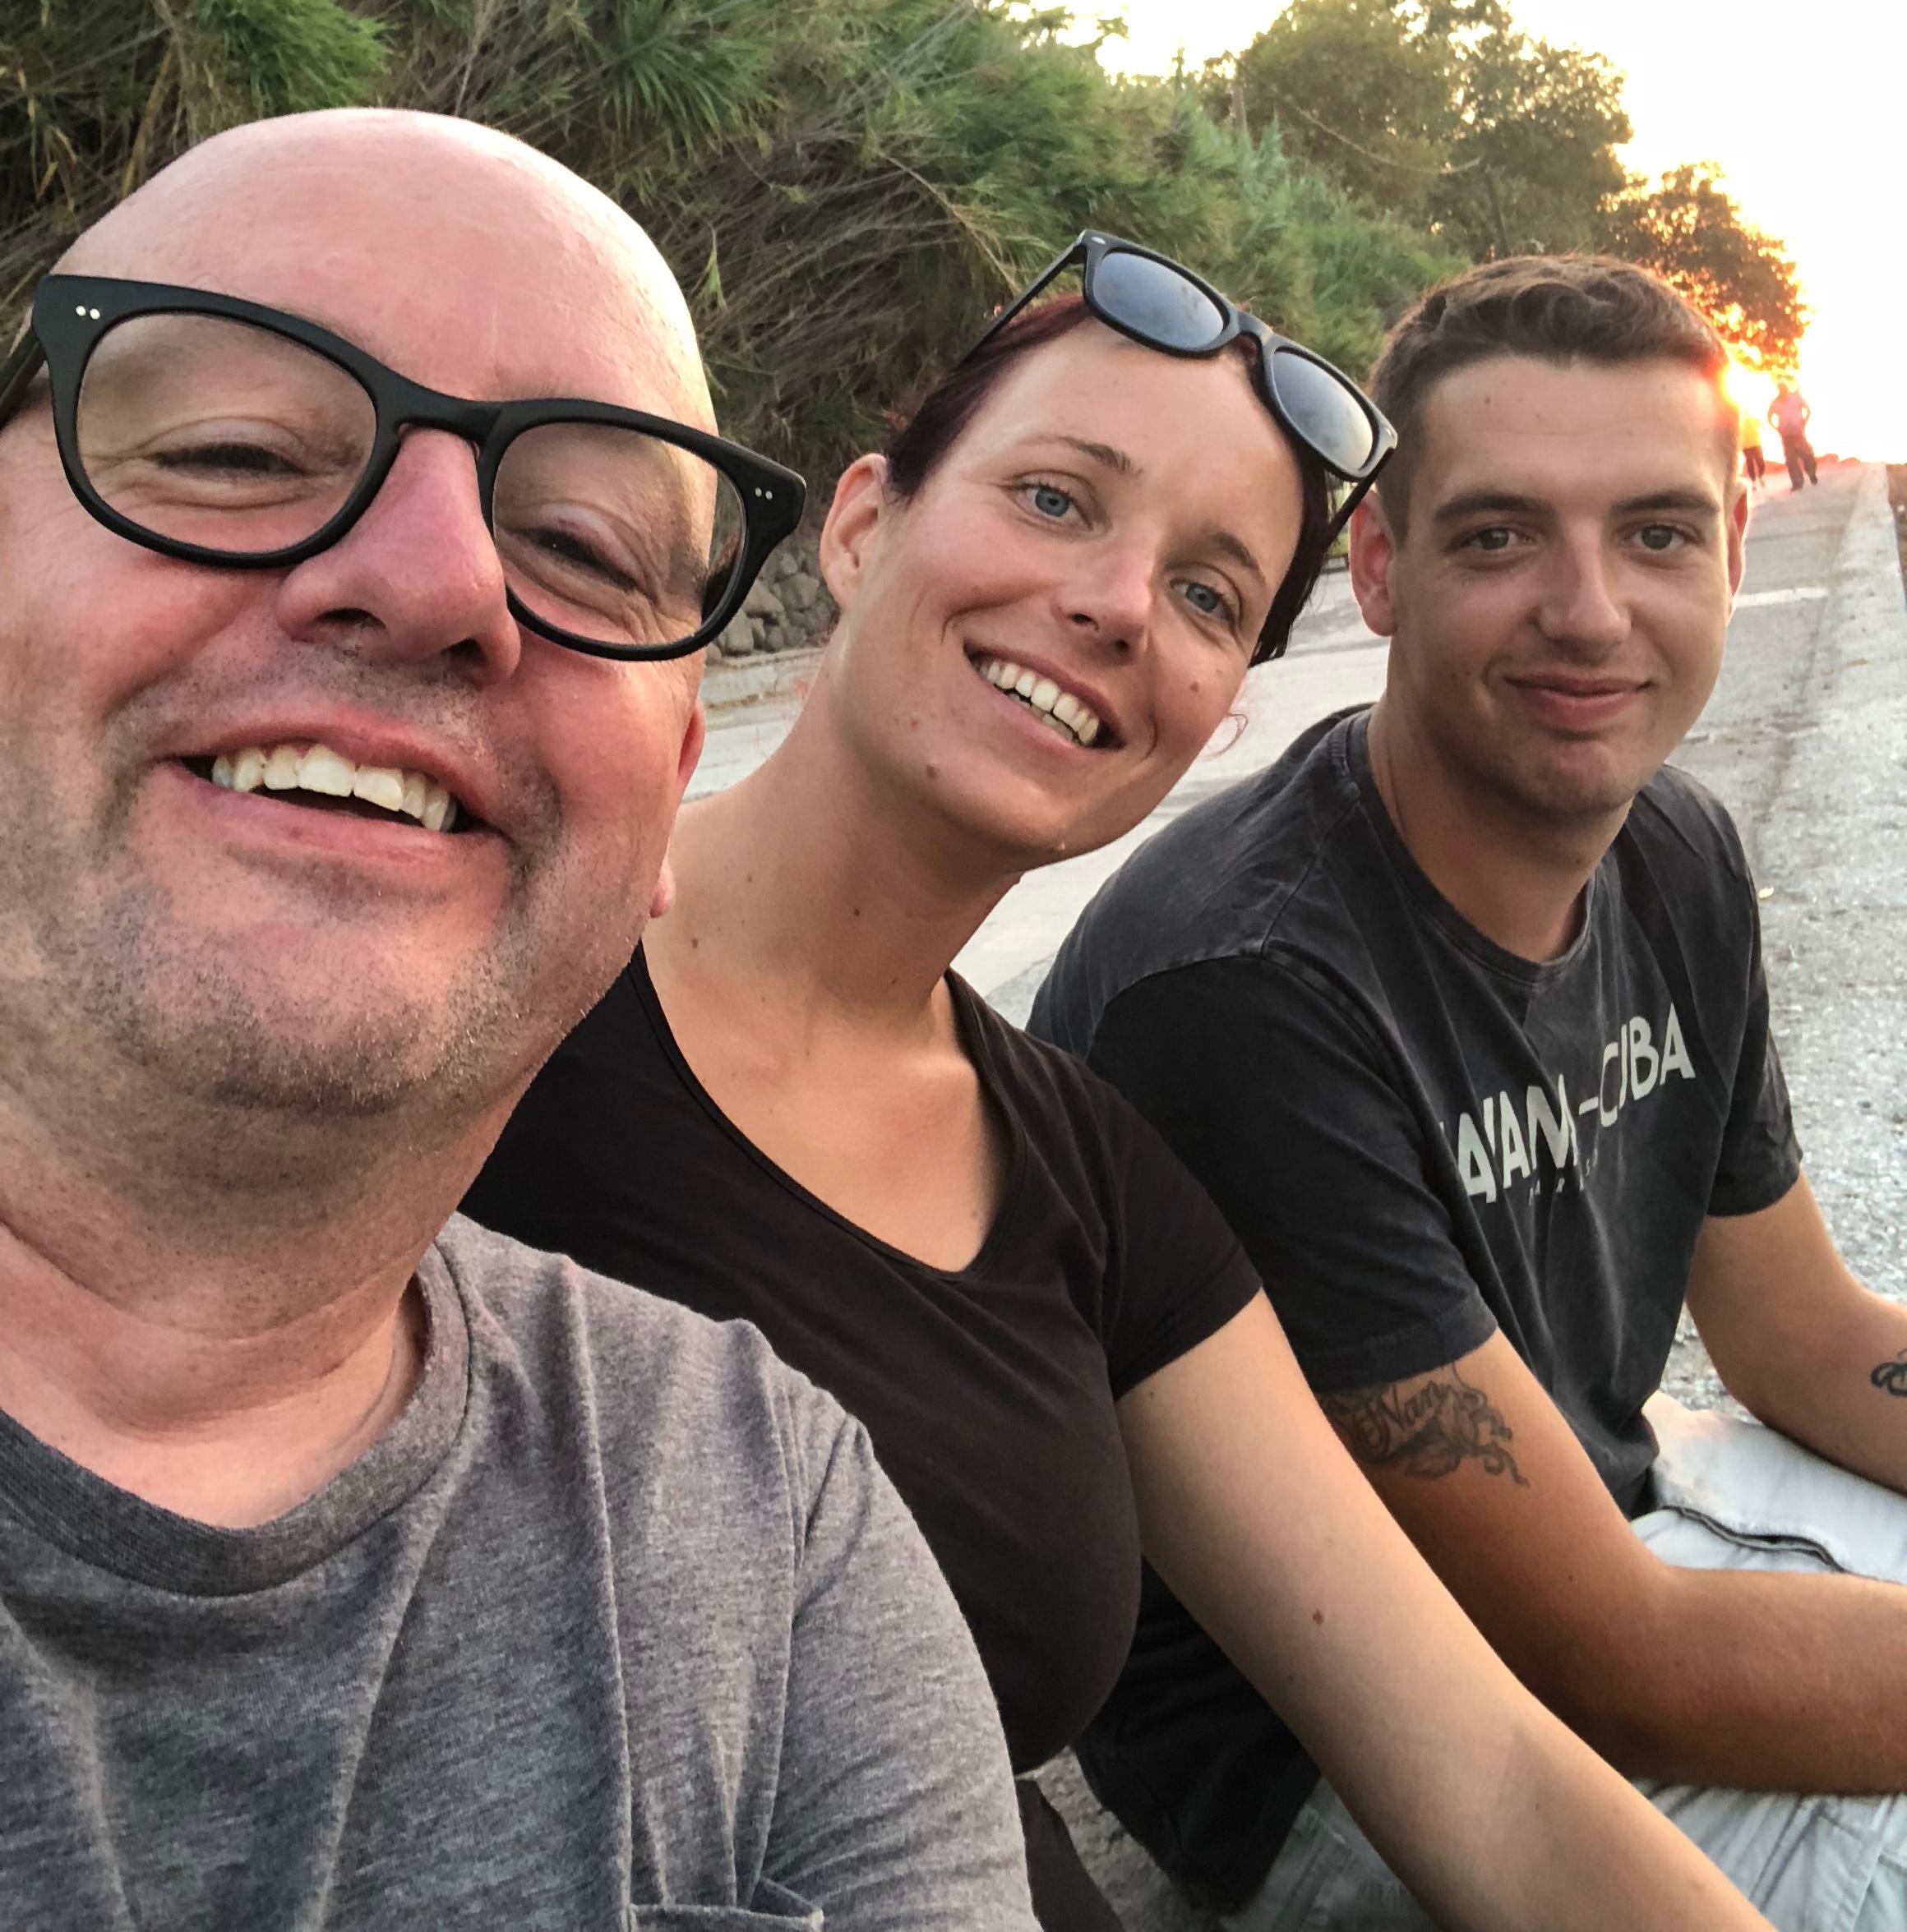 Berg-05-Aug-2018-20-10-33-IMG_0363.jpg